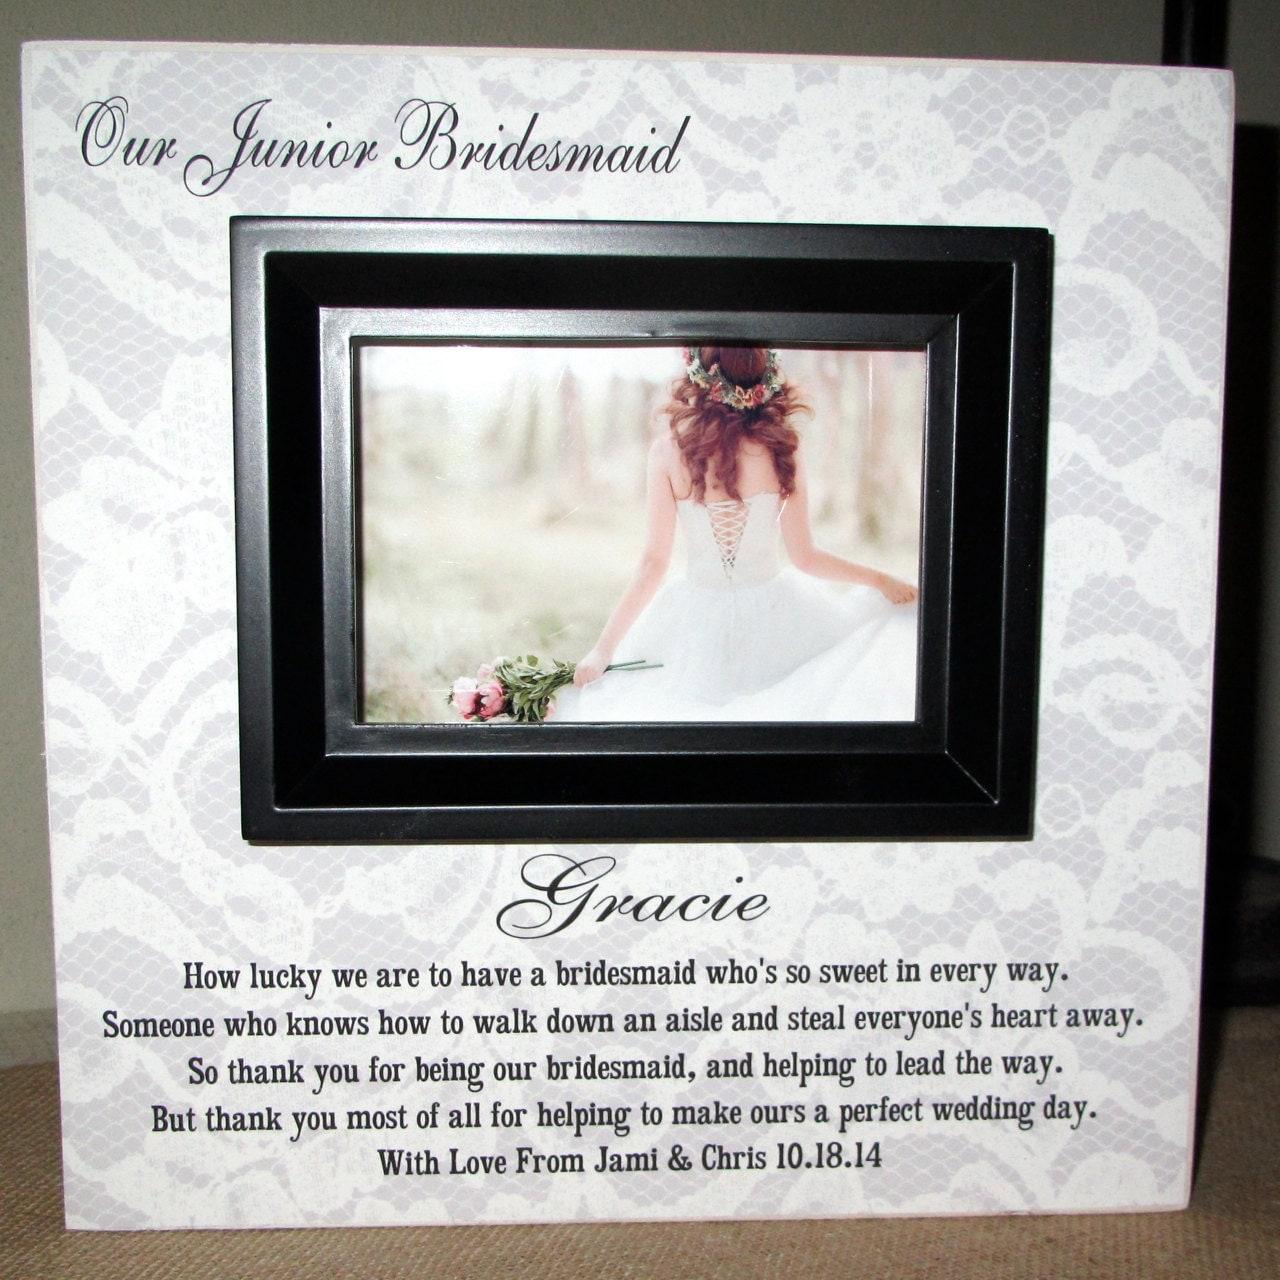 Wedding Gift Ideas For Junior Bridesmaids : Personalized Junior Bridesmaid Gift Junior Bridesmaid Picture